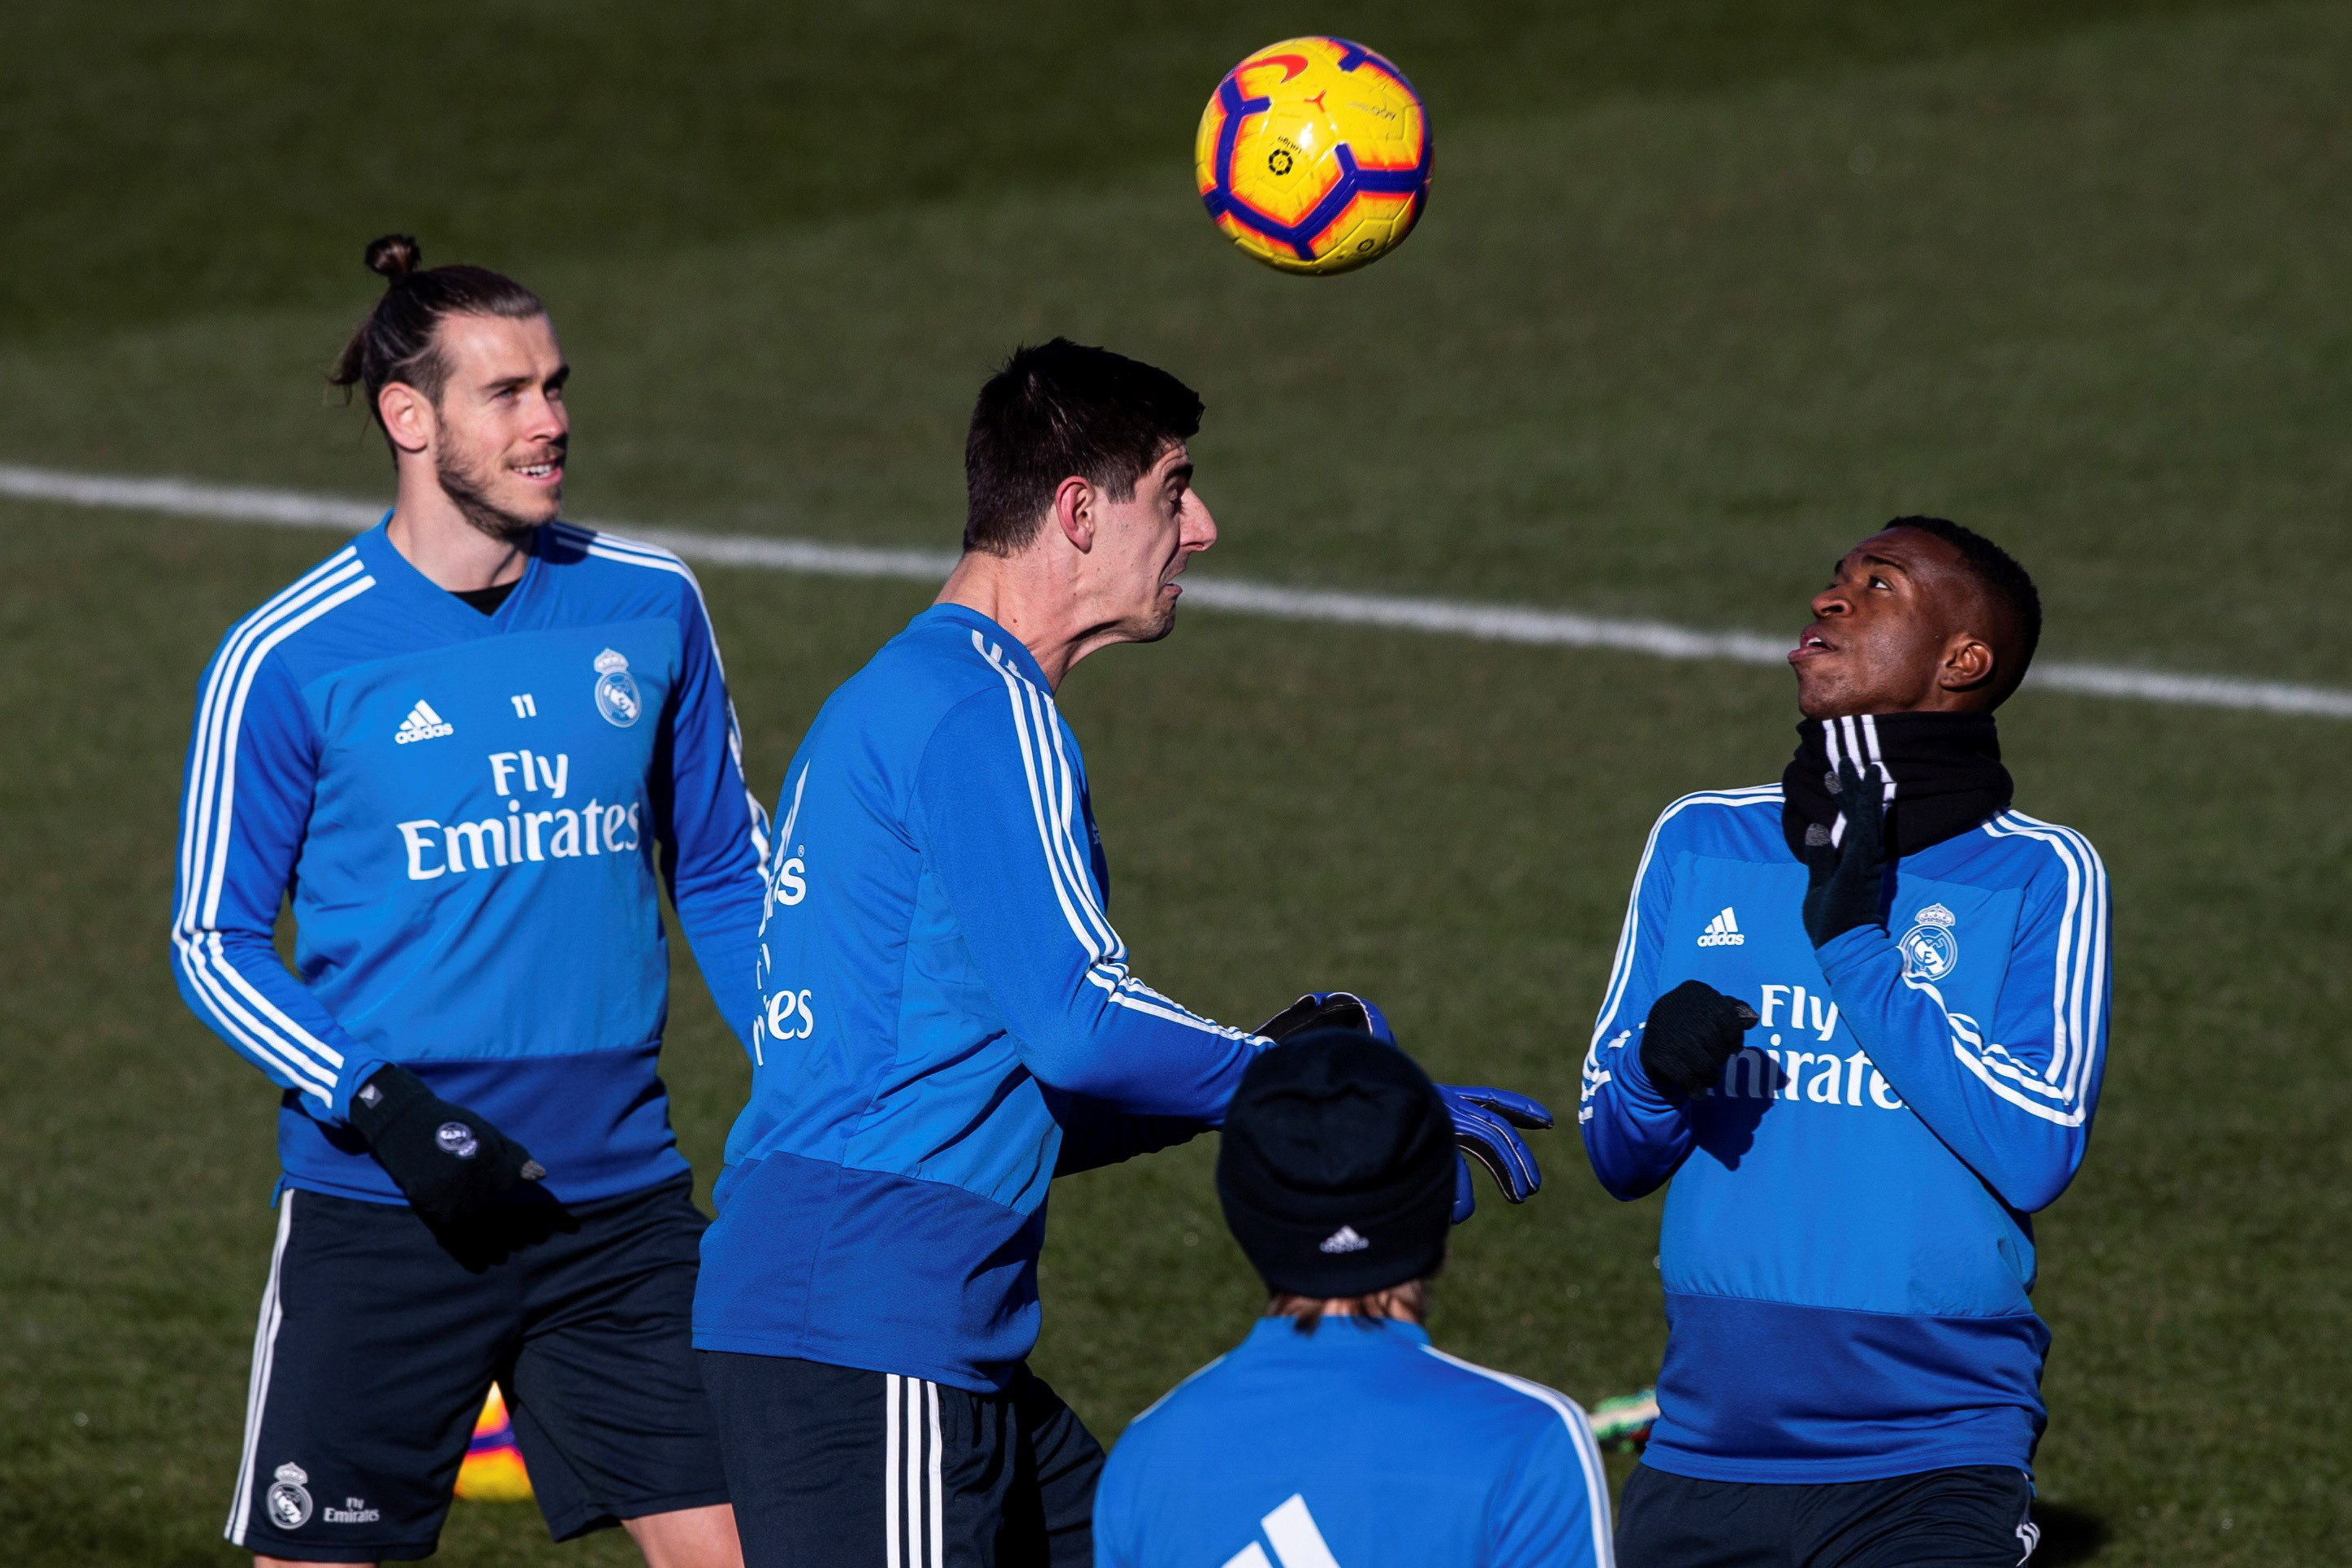 GRAF5420. Madrid (Spain), 26/01/2019.- Real Madrid's Welsh forward Gareth Bale (L), Belgian goalie Thibaut Courtois (C) and Brazilian forward Vinicius jr. (R) attend the team's training session in Valdebebas sports city in Madrid, Spain, 26 January 2019. Real Madrid faces RCD Espanyol 27 January 2019 in a Primera Division Liga match. (Brasil, España) EFE/EPA/Rodrigo Jimenez